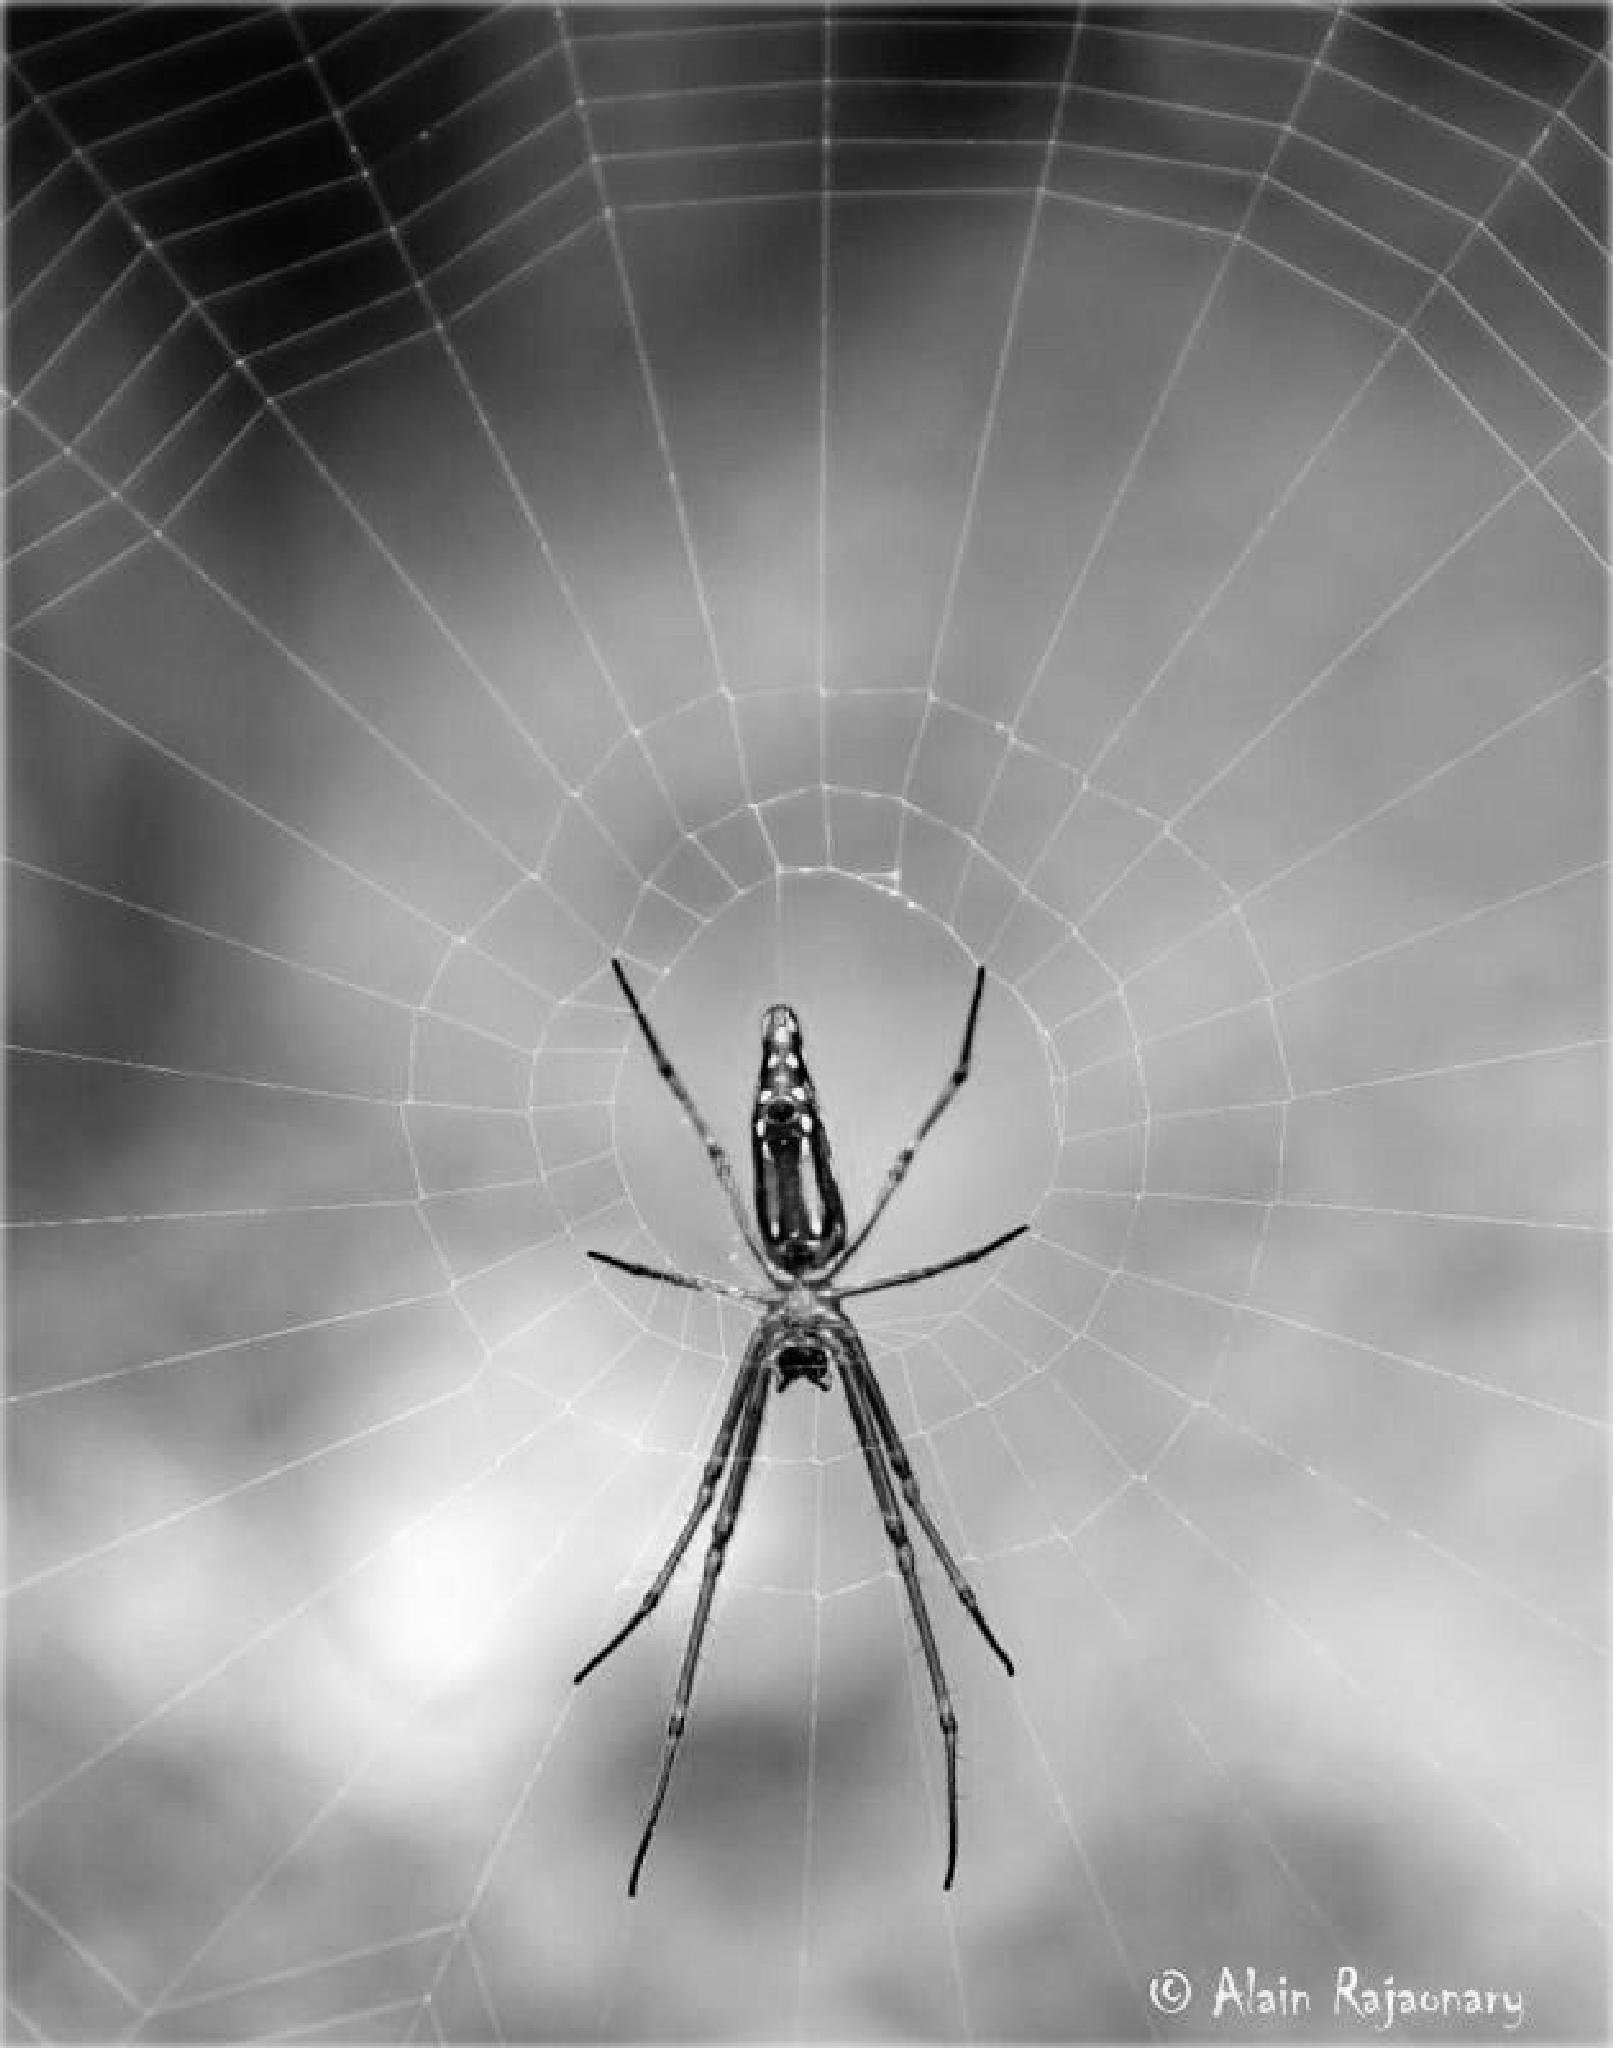 The Web by Rajaonary Alain